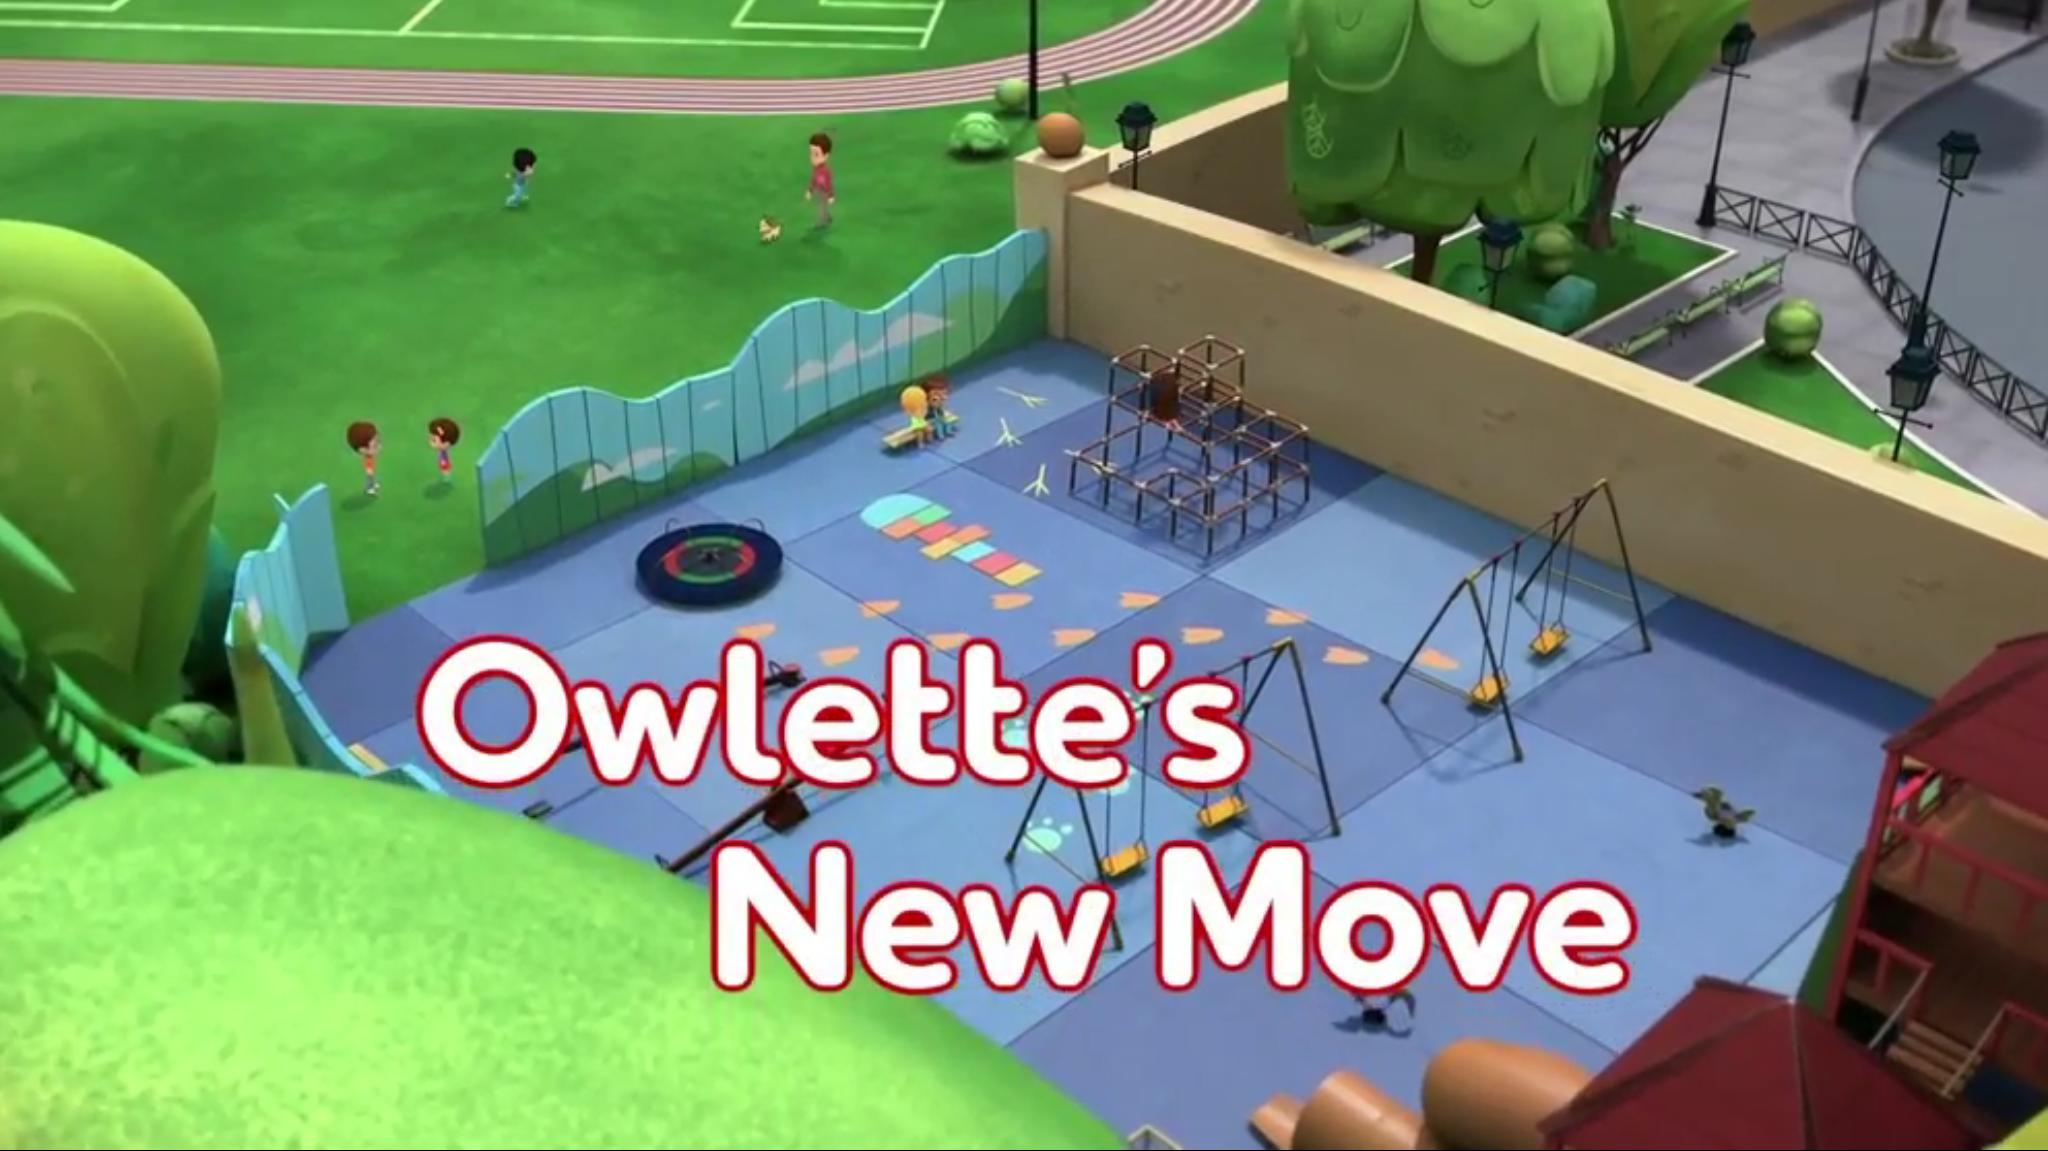 Owlette's New Move